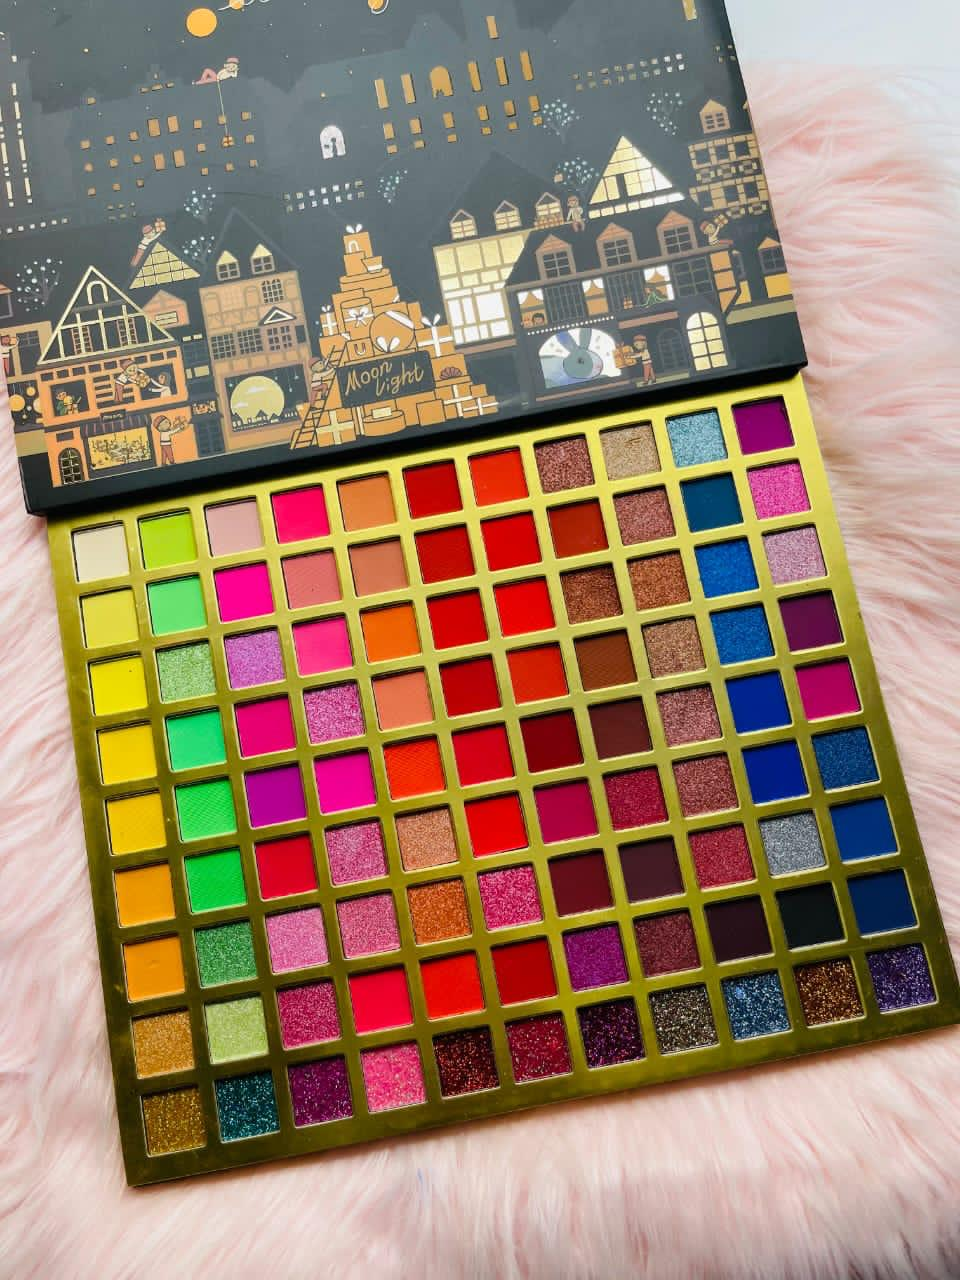 mifu duo eyeshadow palette price in pakistan